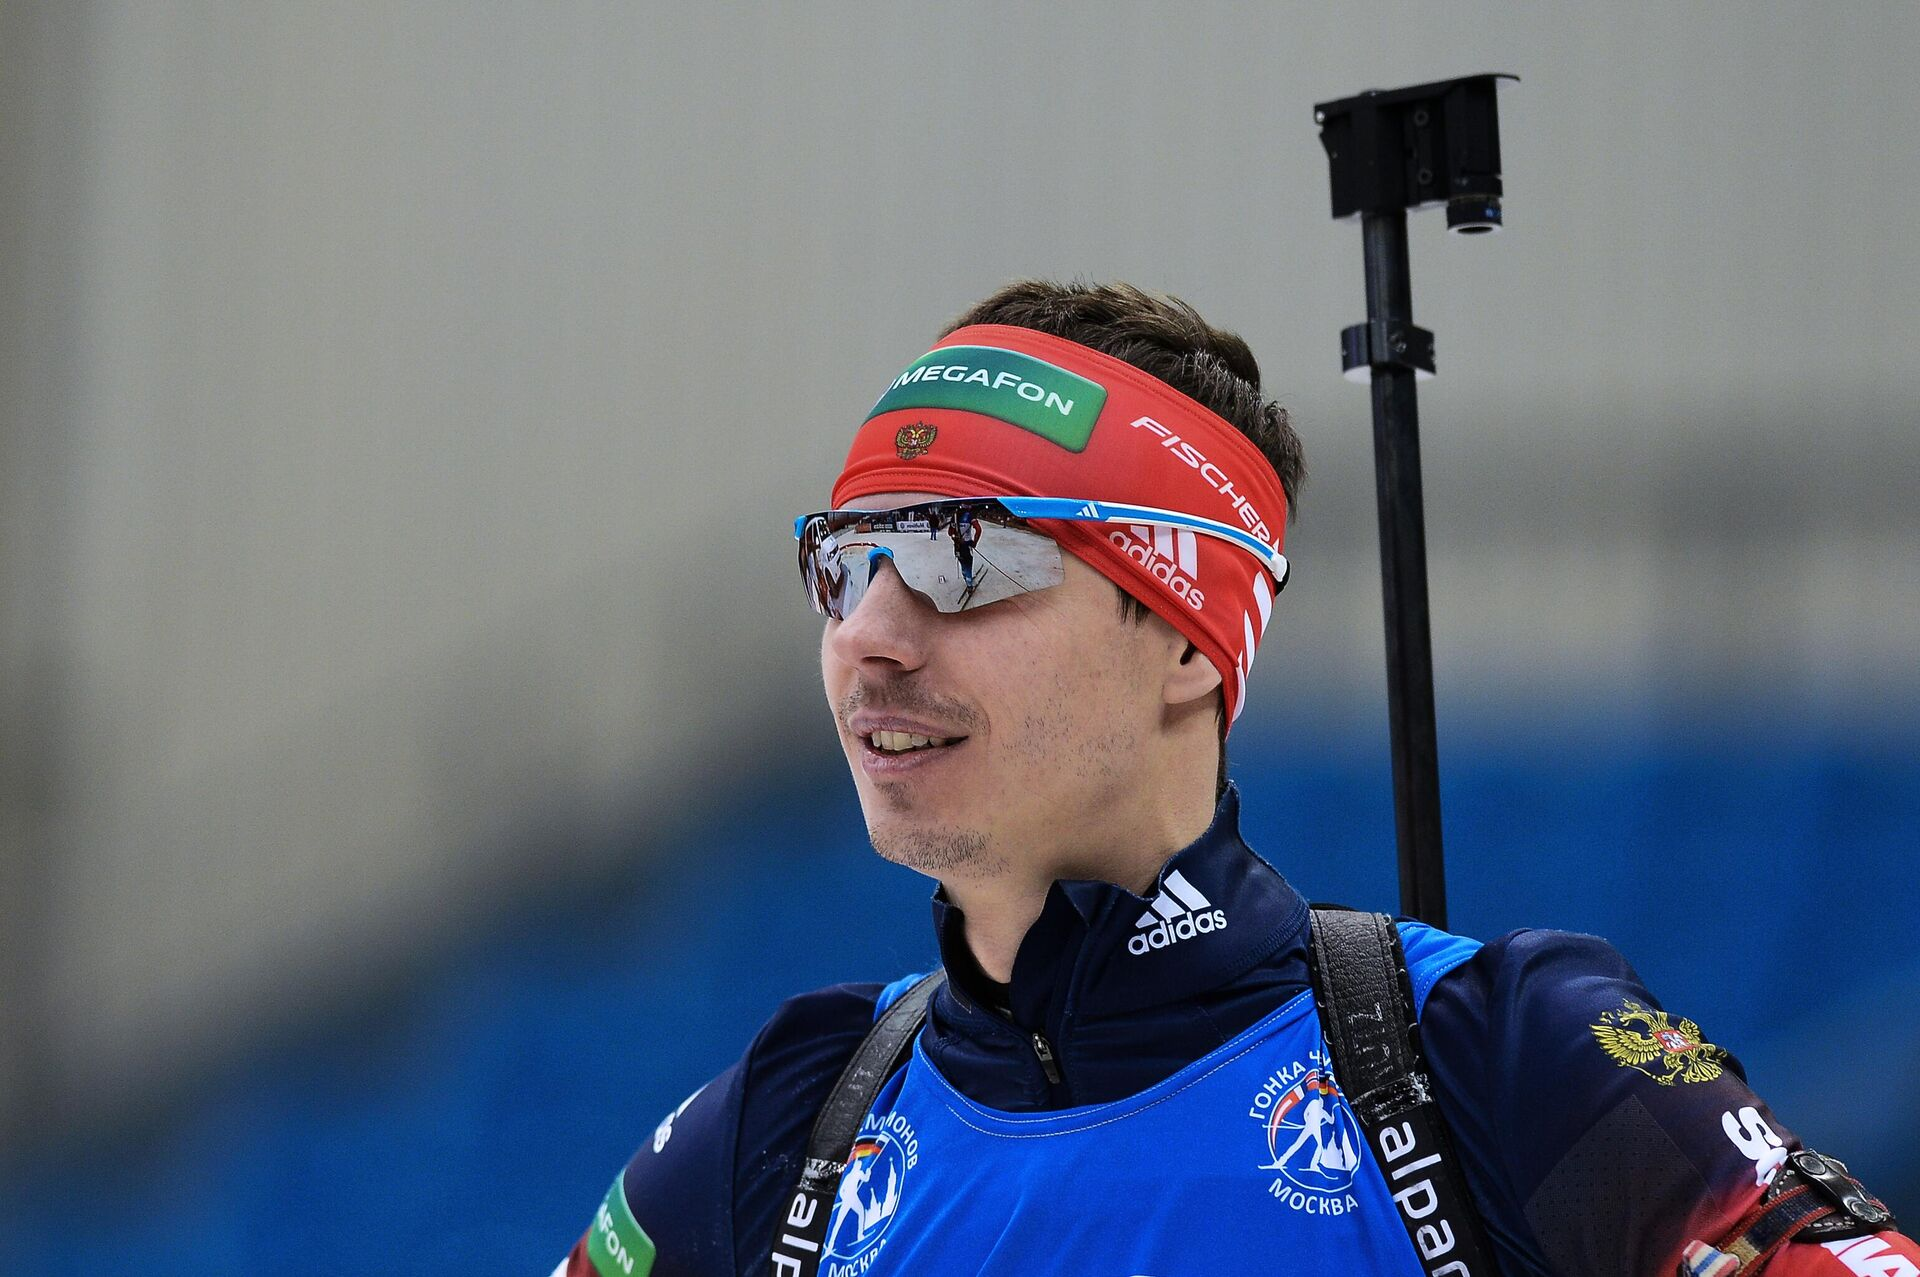 Биатлонист Евгений Устюгов - РИА Новости, 1920, 02.01.2021